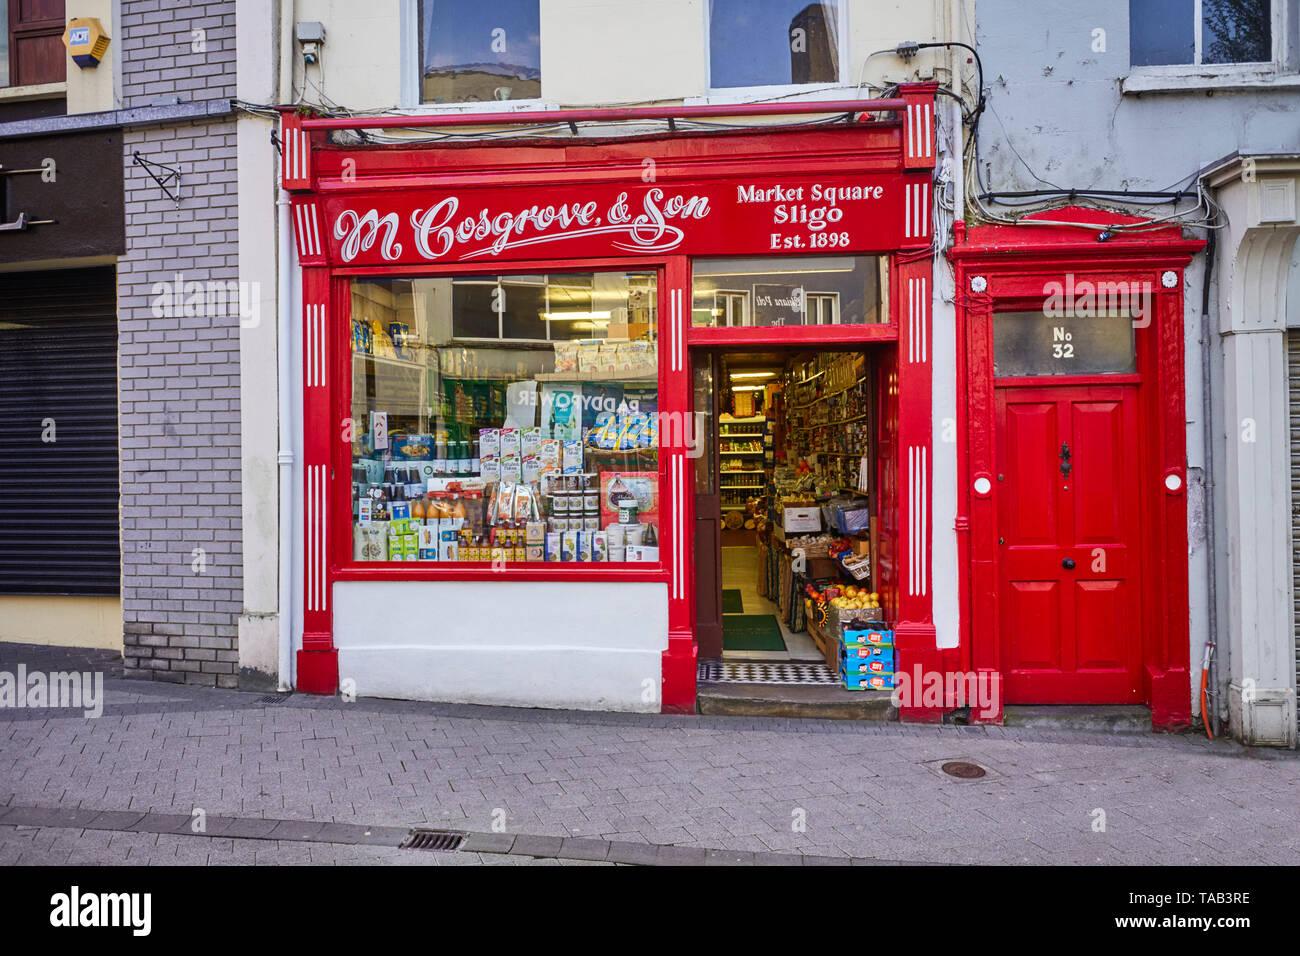 M Cosgrove & Son grocery shop in Market Square, Sligo, Ireland - Stock Image